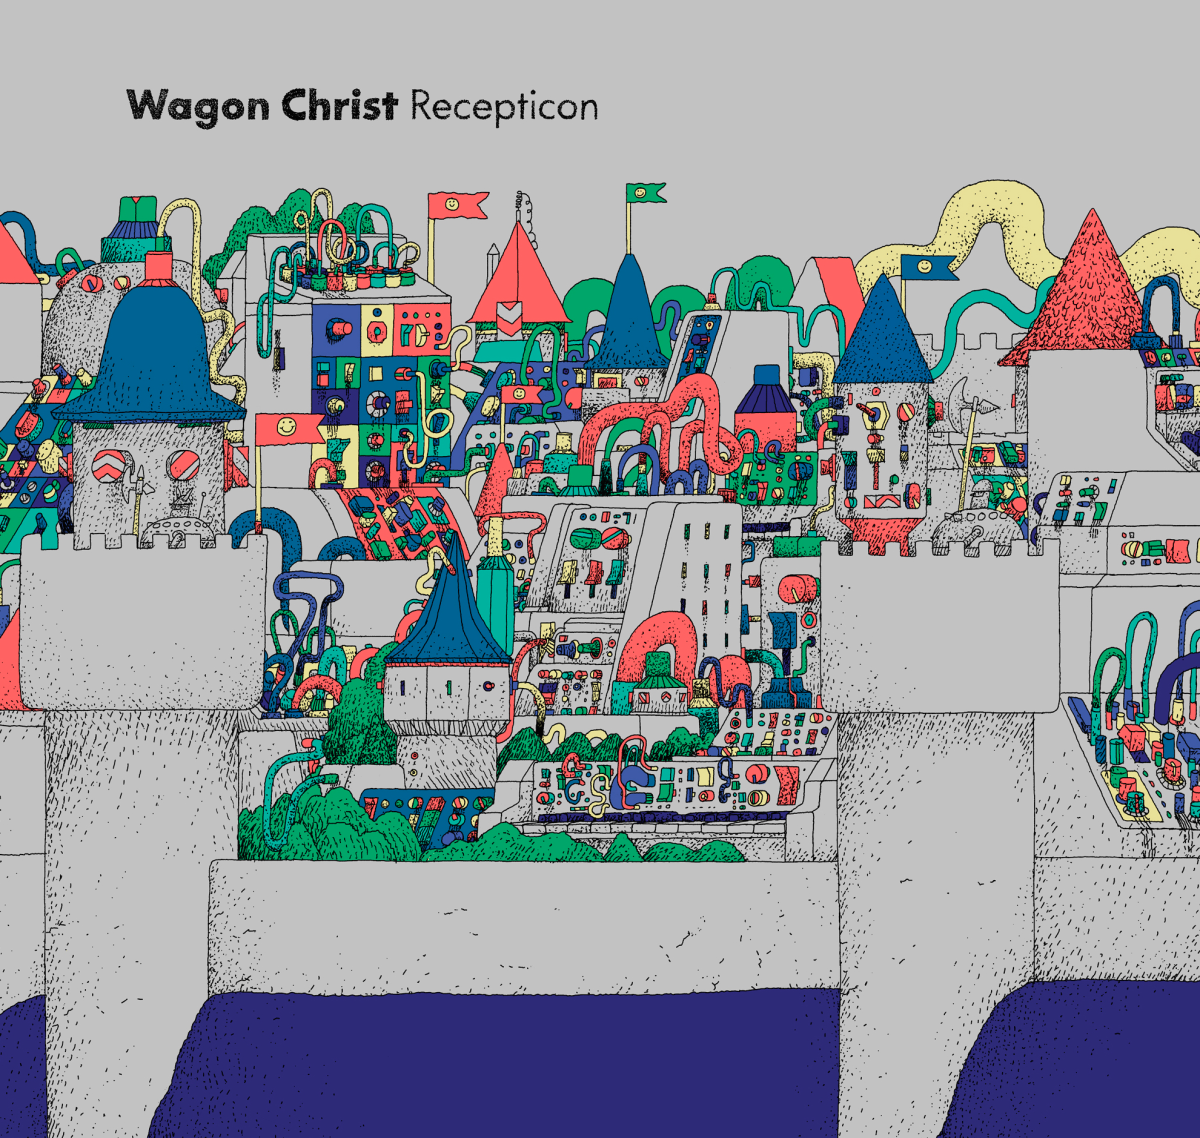 Wagon Christ Reception